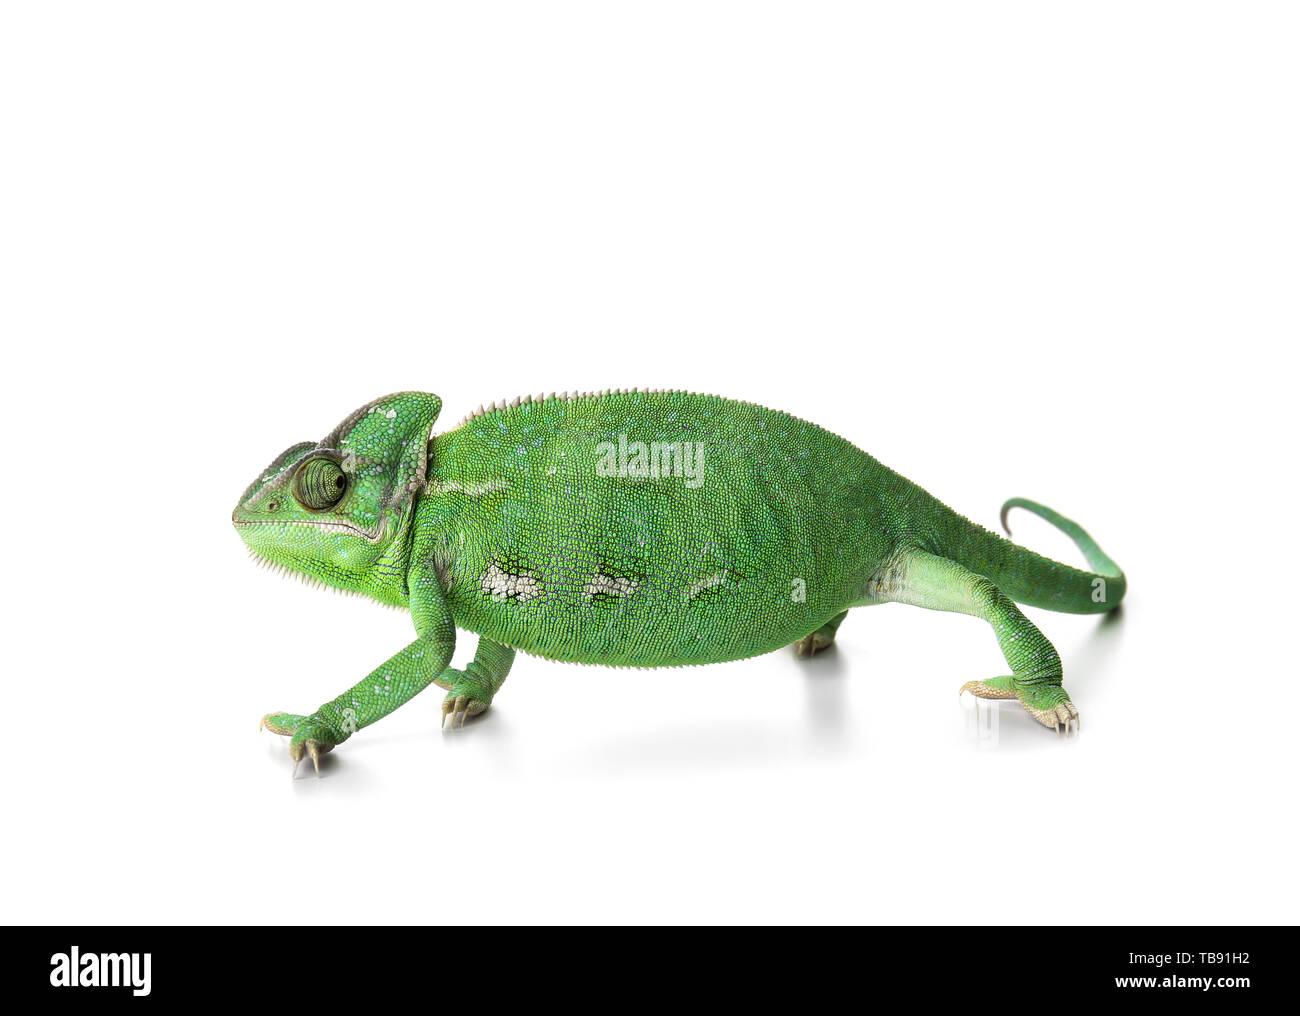 Cute green chameleon on white background - Stock Image